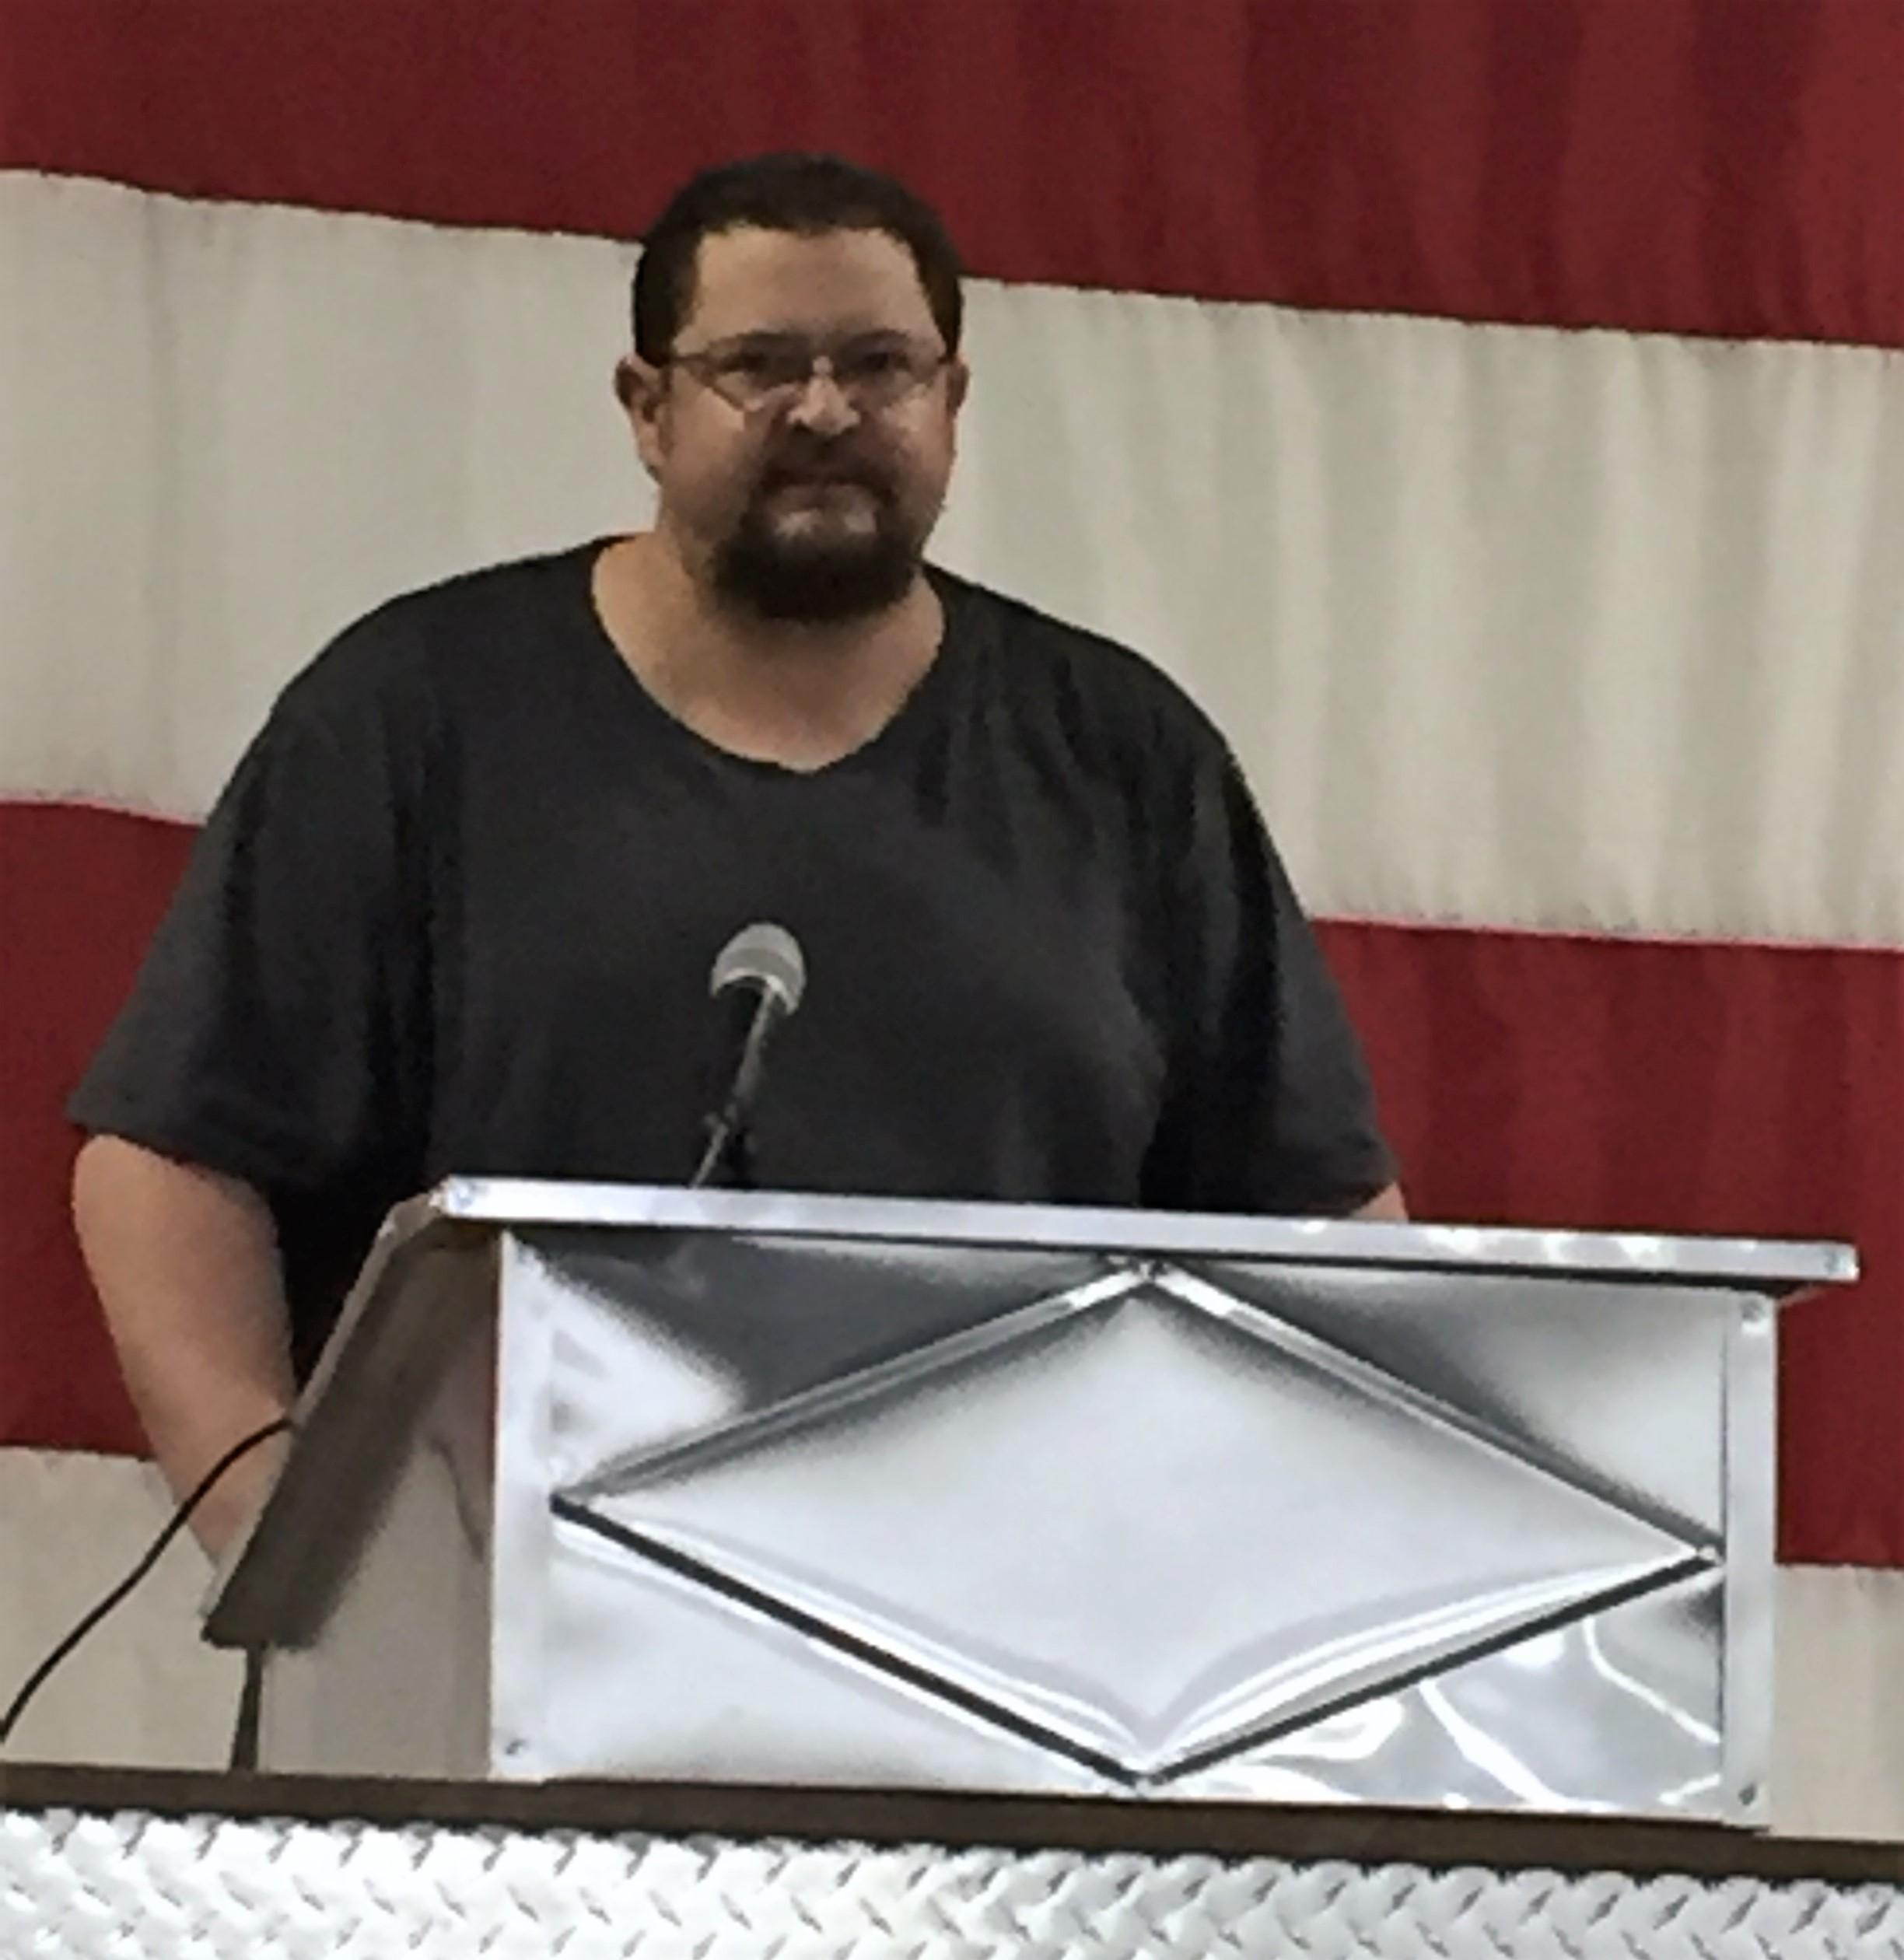 BTA 103 Joel Mills Loc37organizer_president.jpg